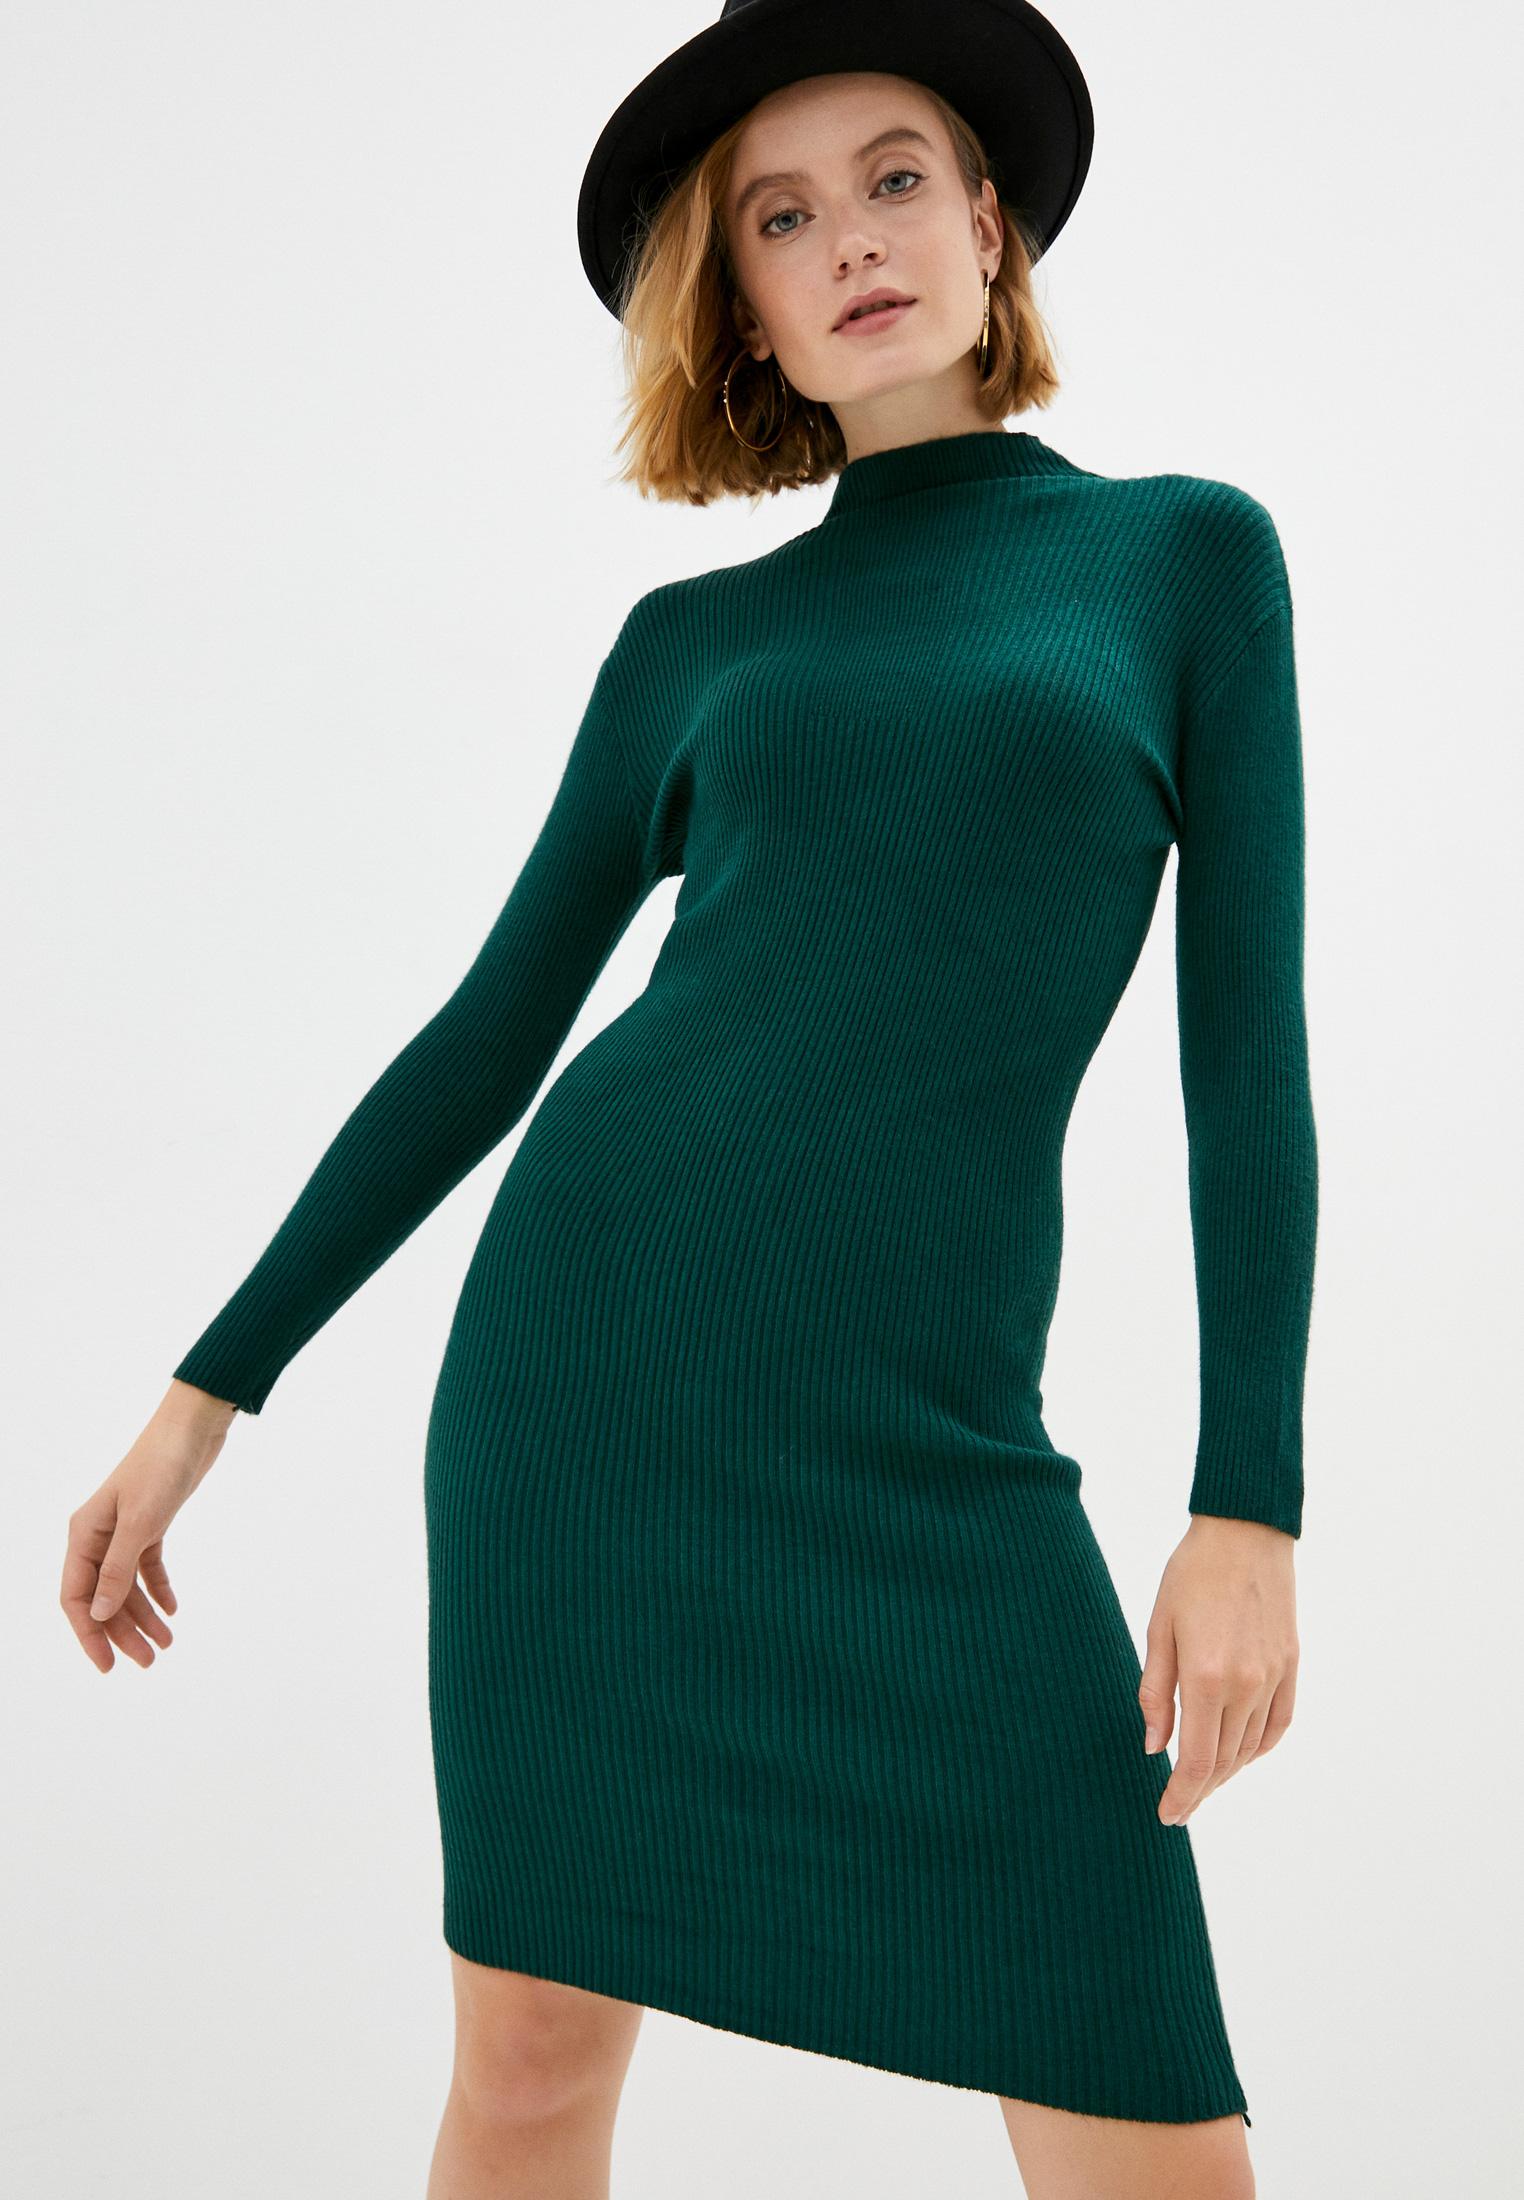 Вязаное платье Vickwool VW265-1